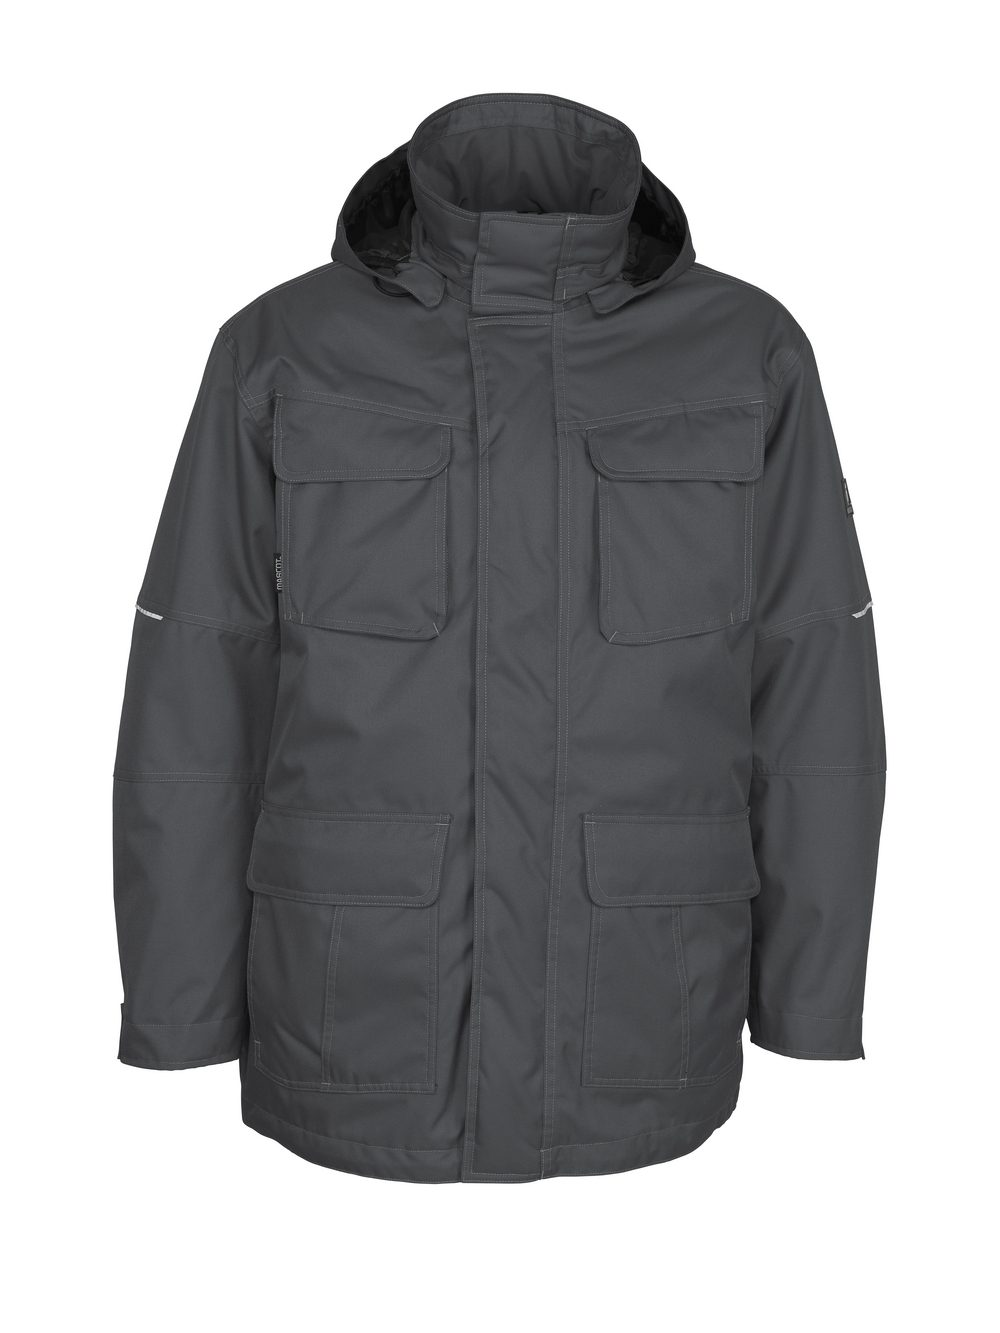 MASCOT Dayton Parka Jacket